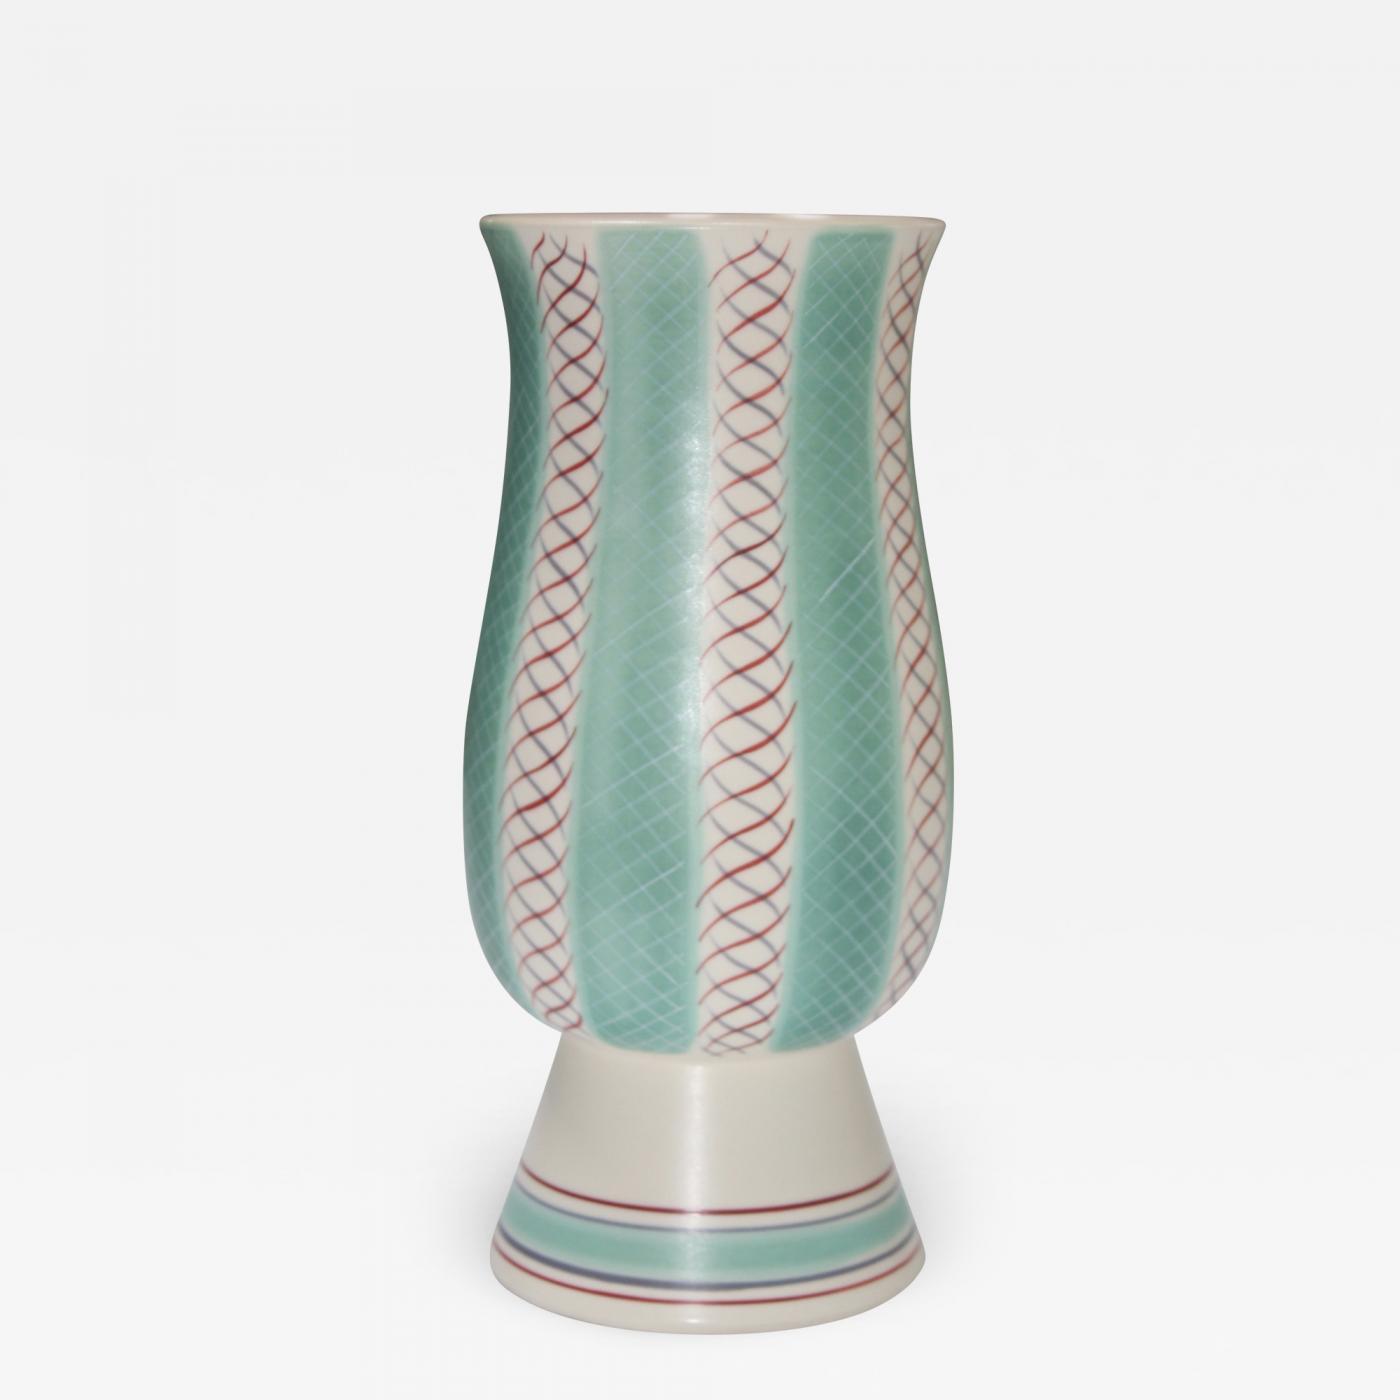 Poole Pottery Mid Century Modern Poole Pottery Vase